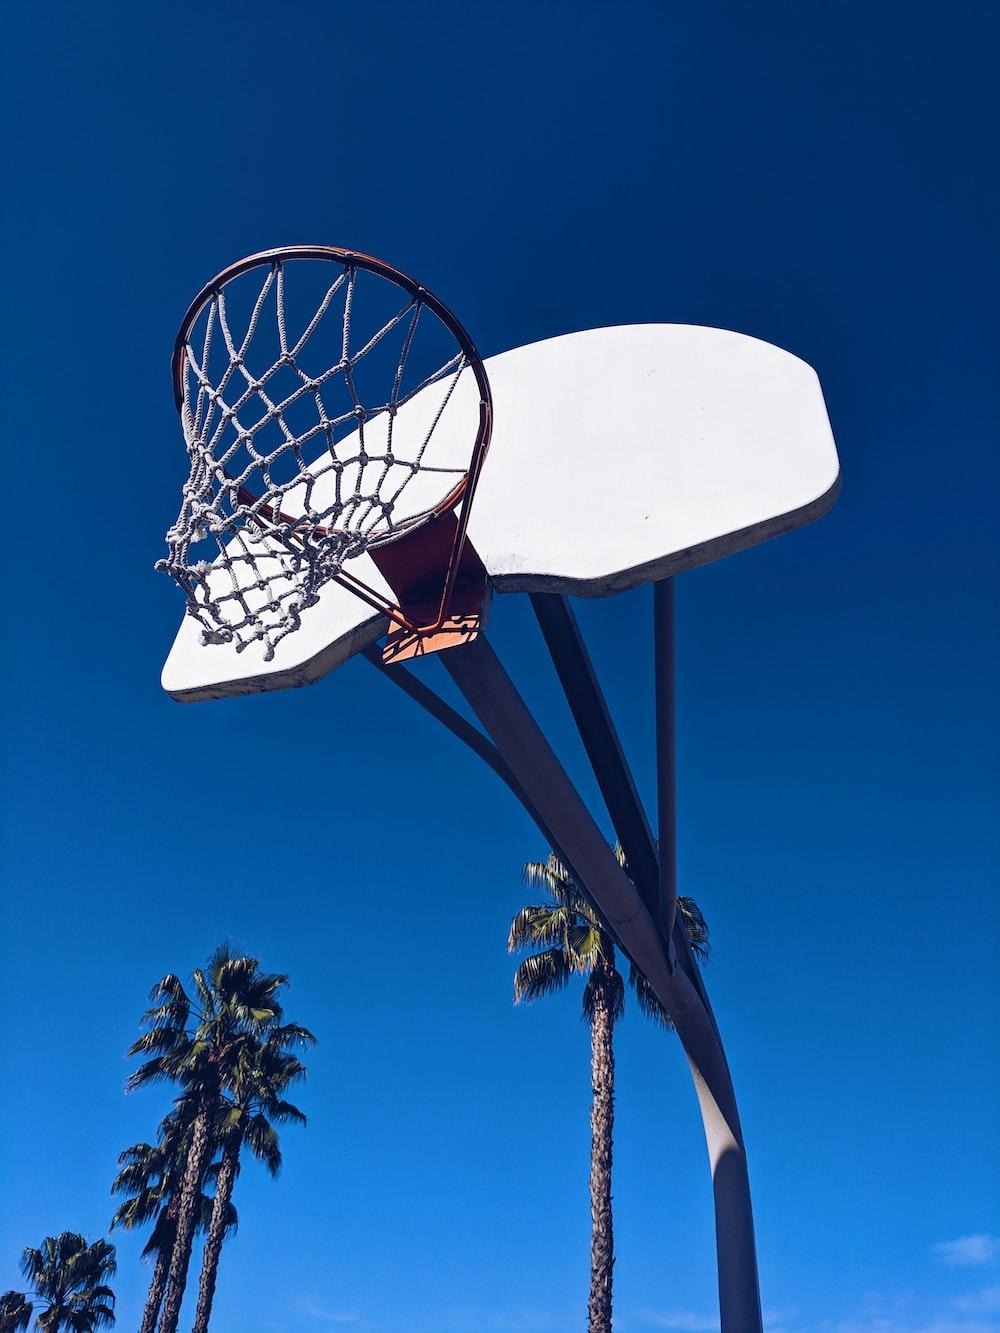 black and white basketball system across blue sky